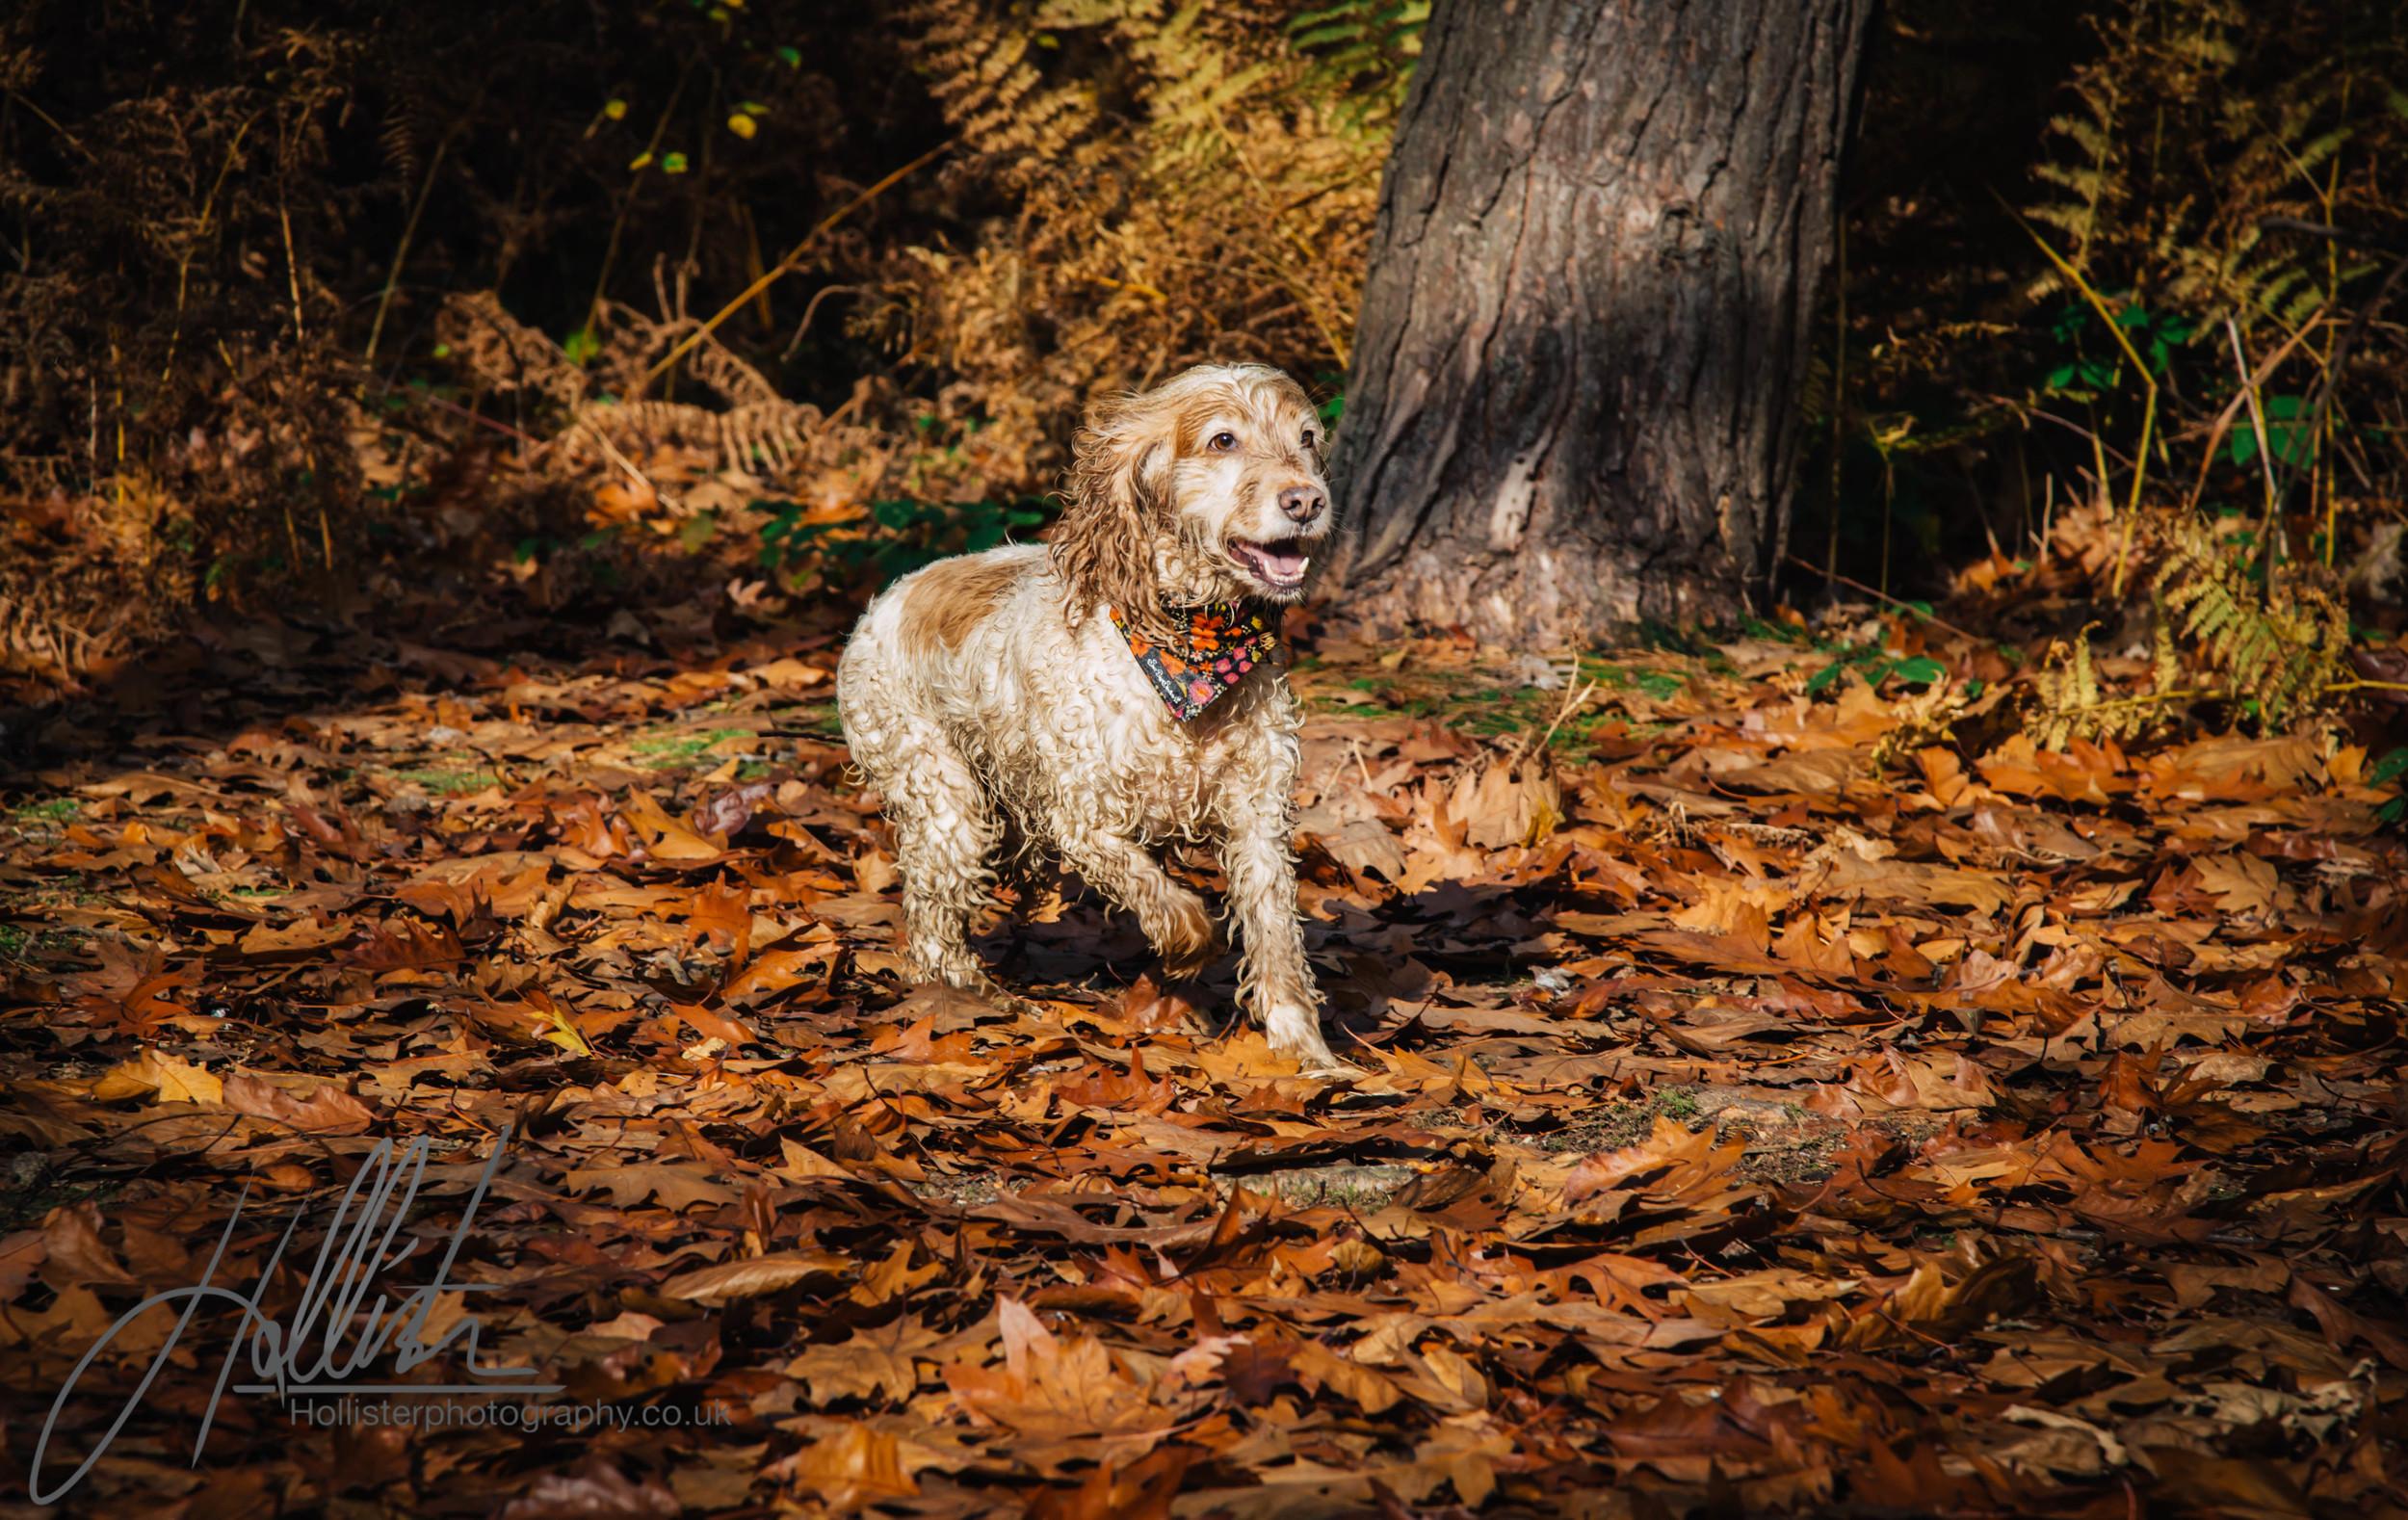 Hollisterphotography ABBY CLOWES WOOD DOG WALK-73.JPG